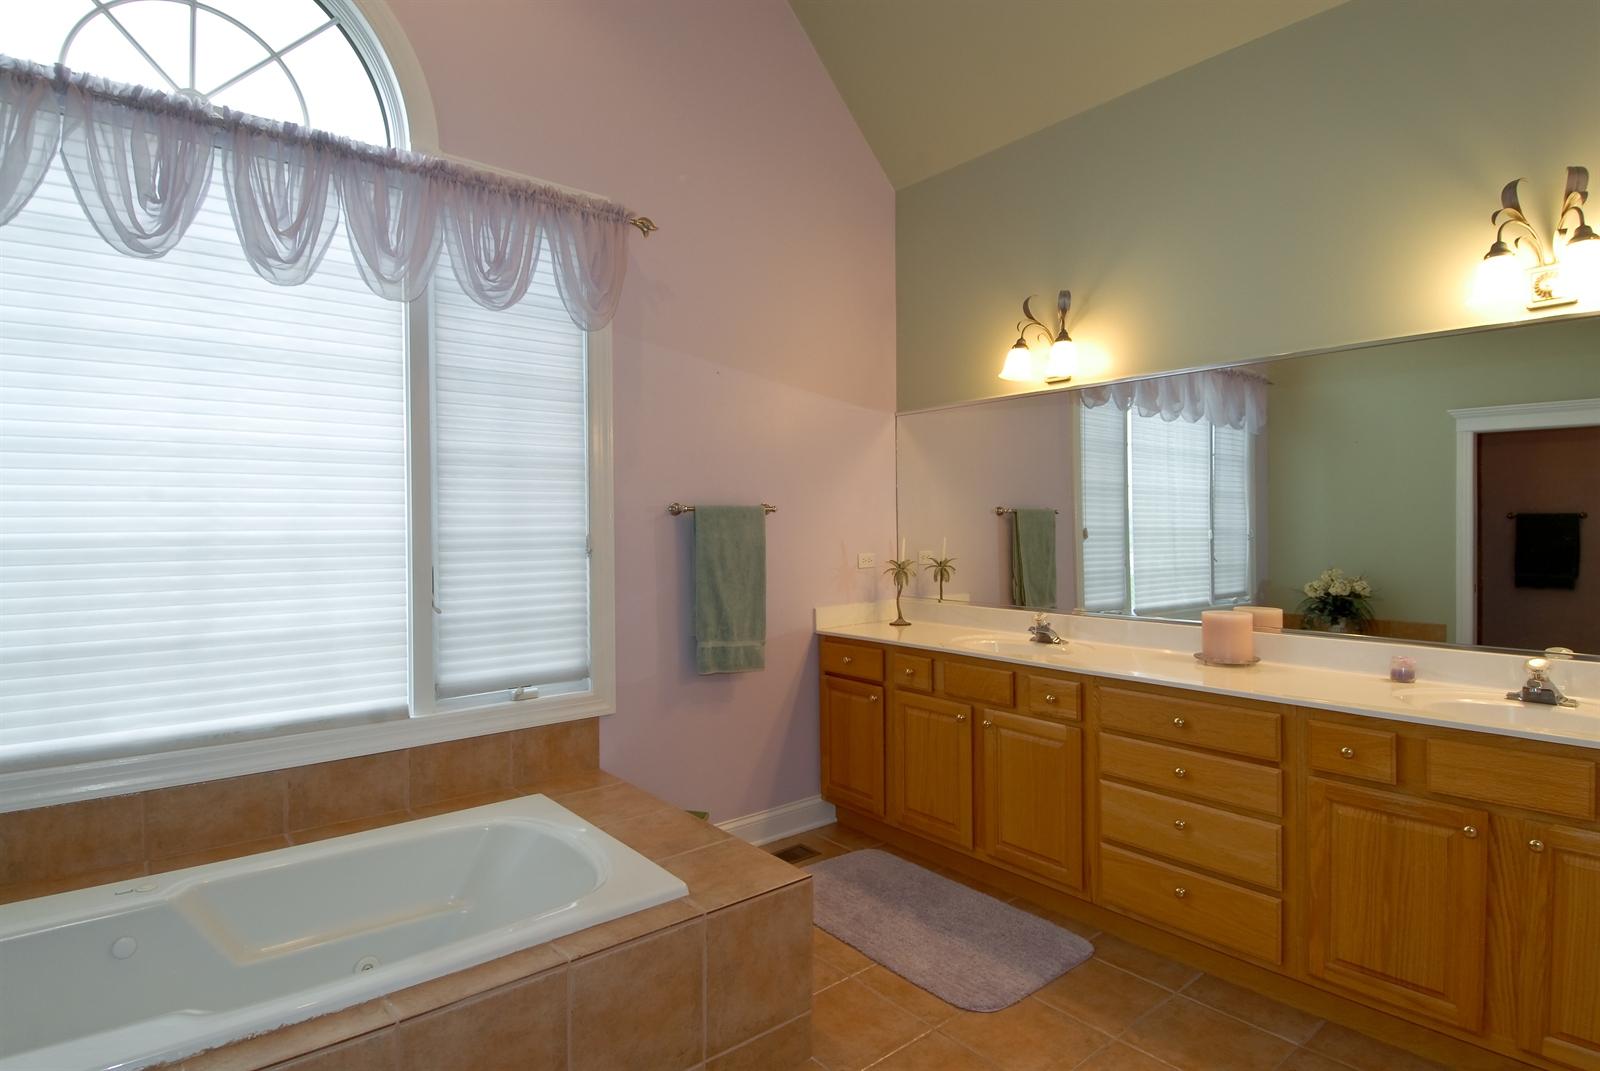 Real Estate Photography - 4N481 Samuel Clemens Dr, Saint Charles, IL, 60175 - Master Bathroom